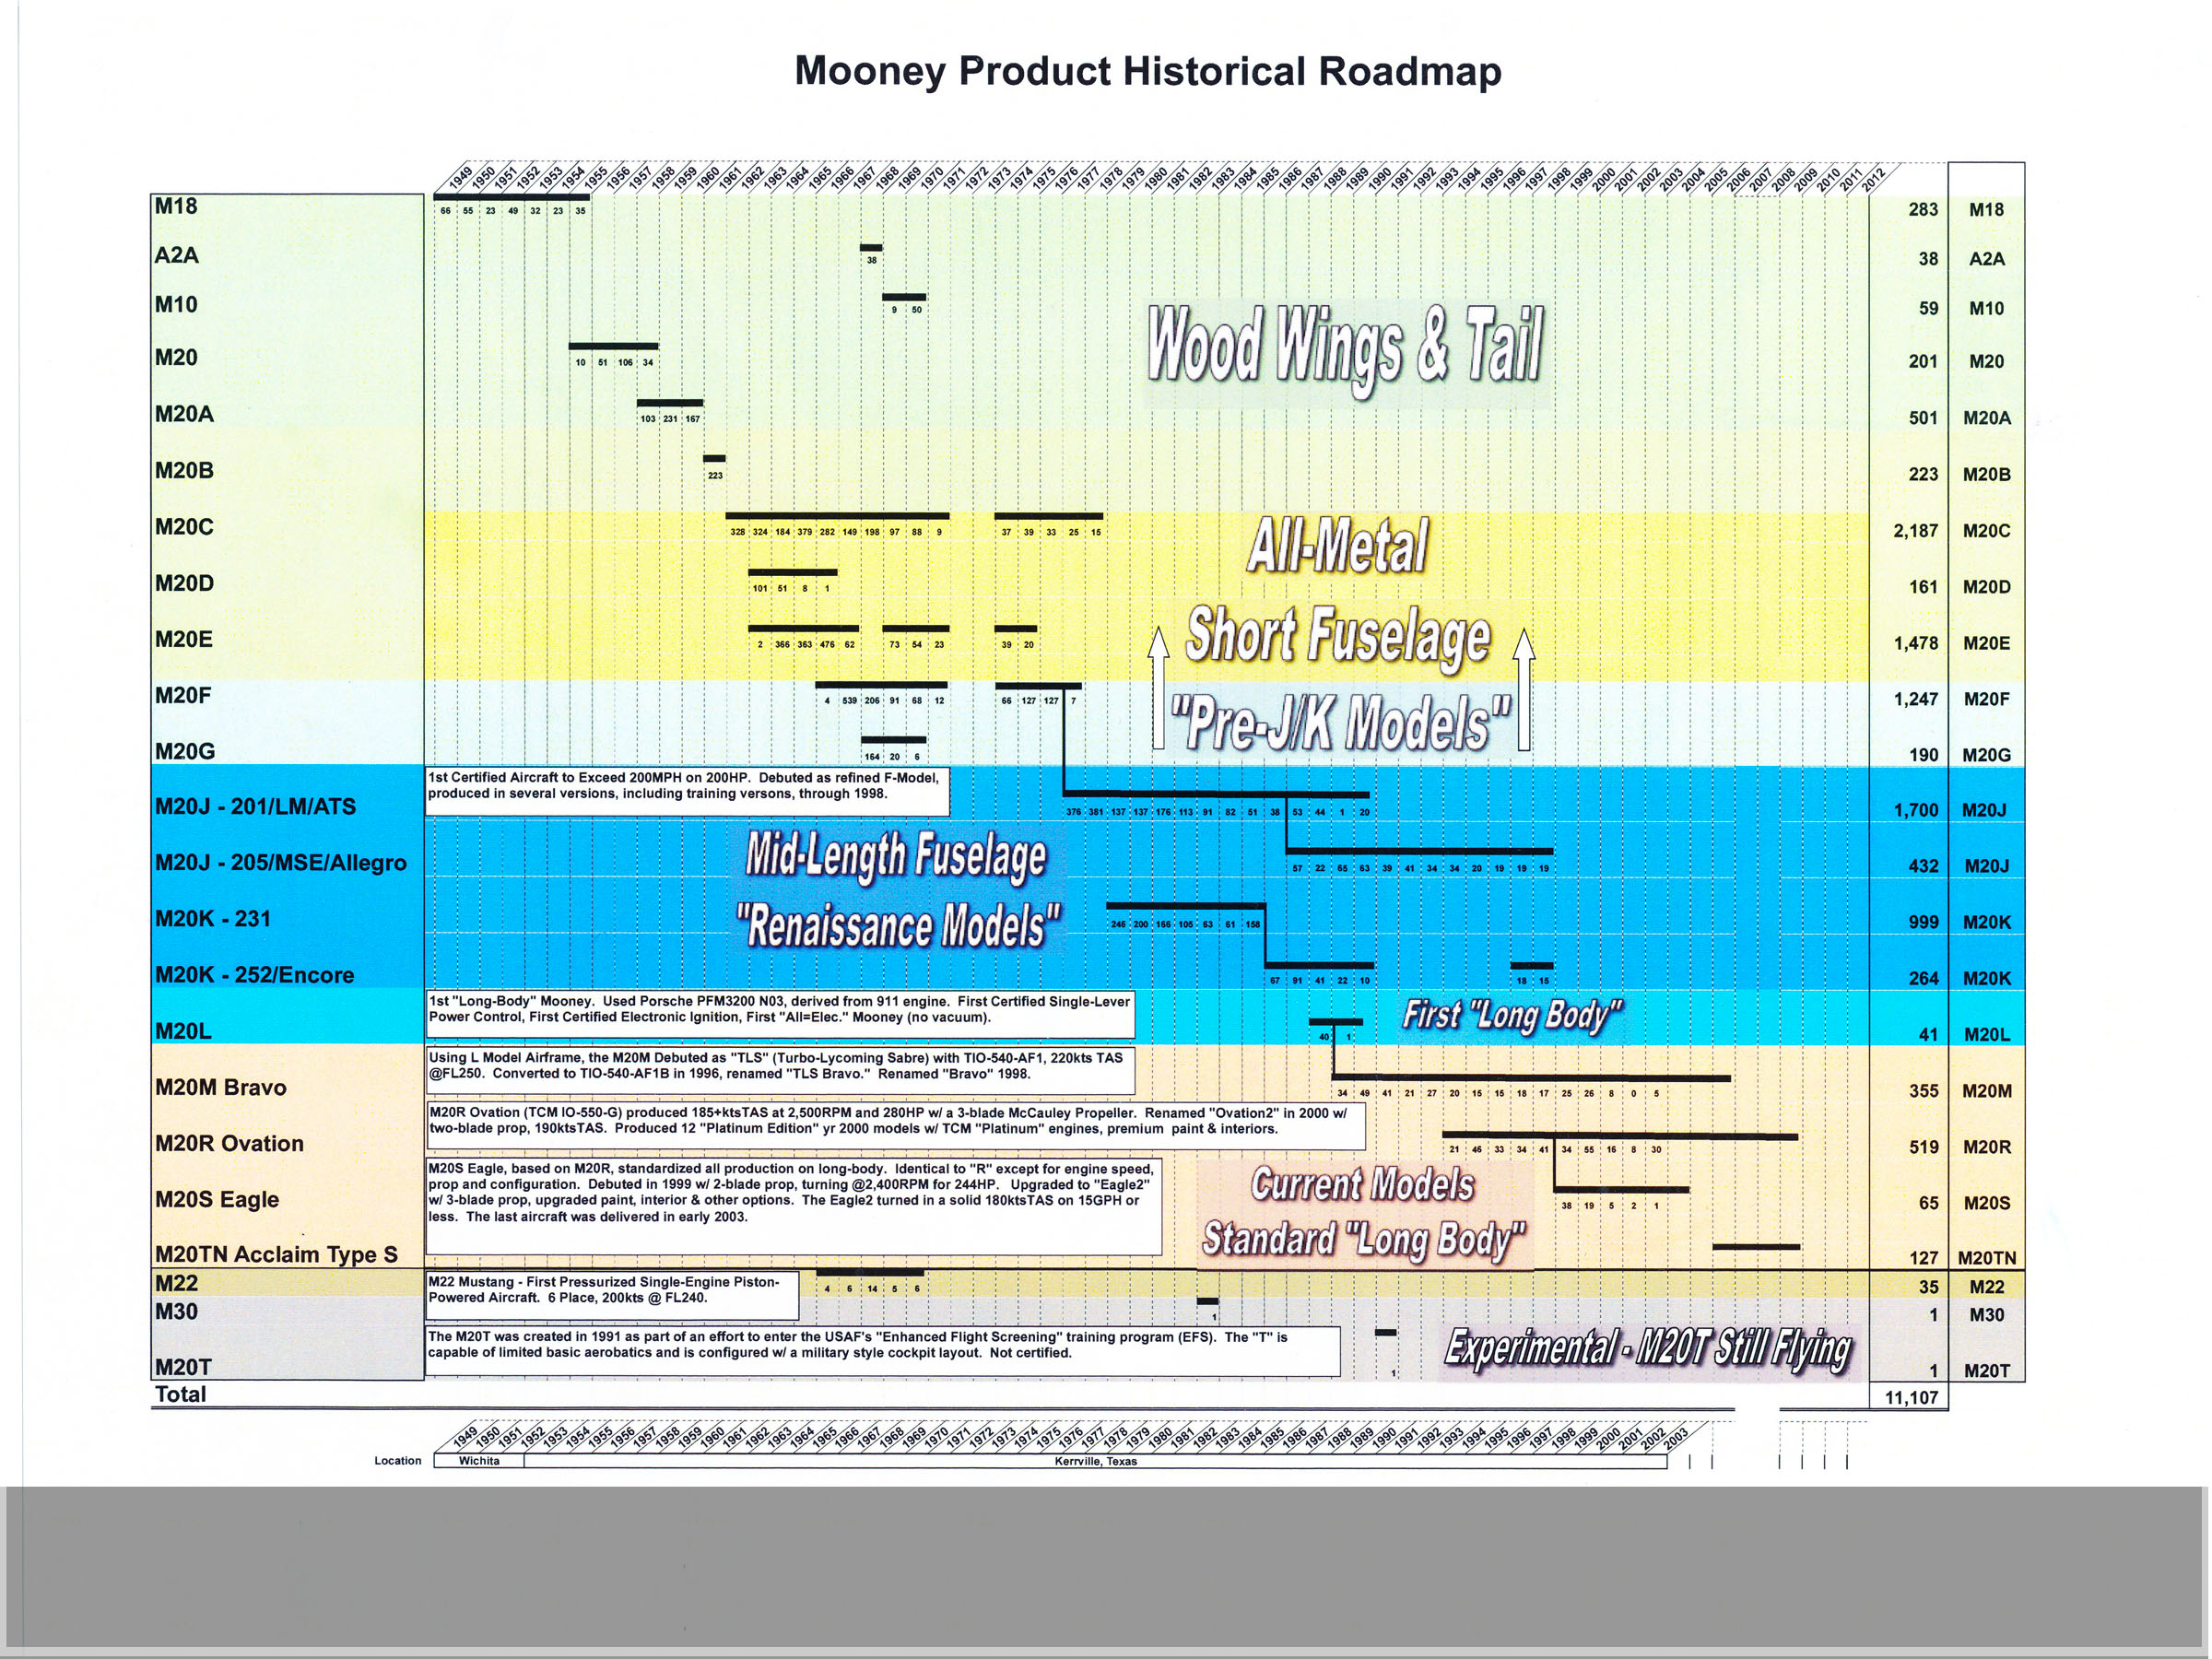 Australia Mooney Pilots Association - Mooney Models